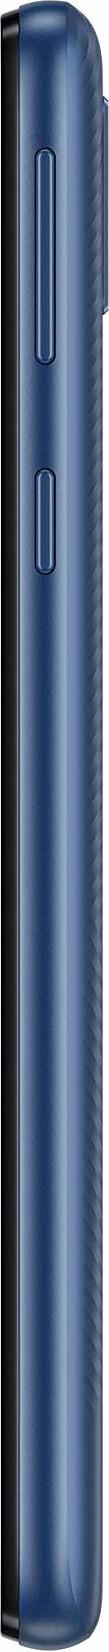 Samsung Galaxy M01 Core